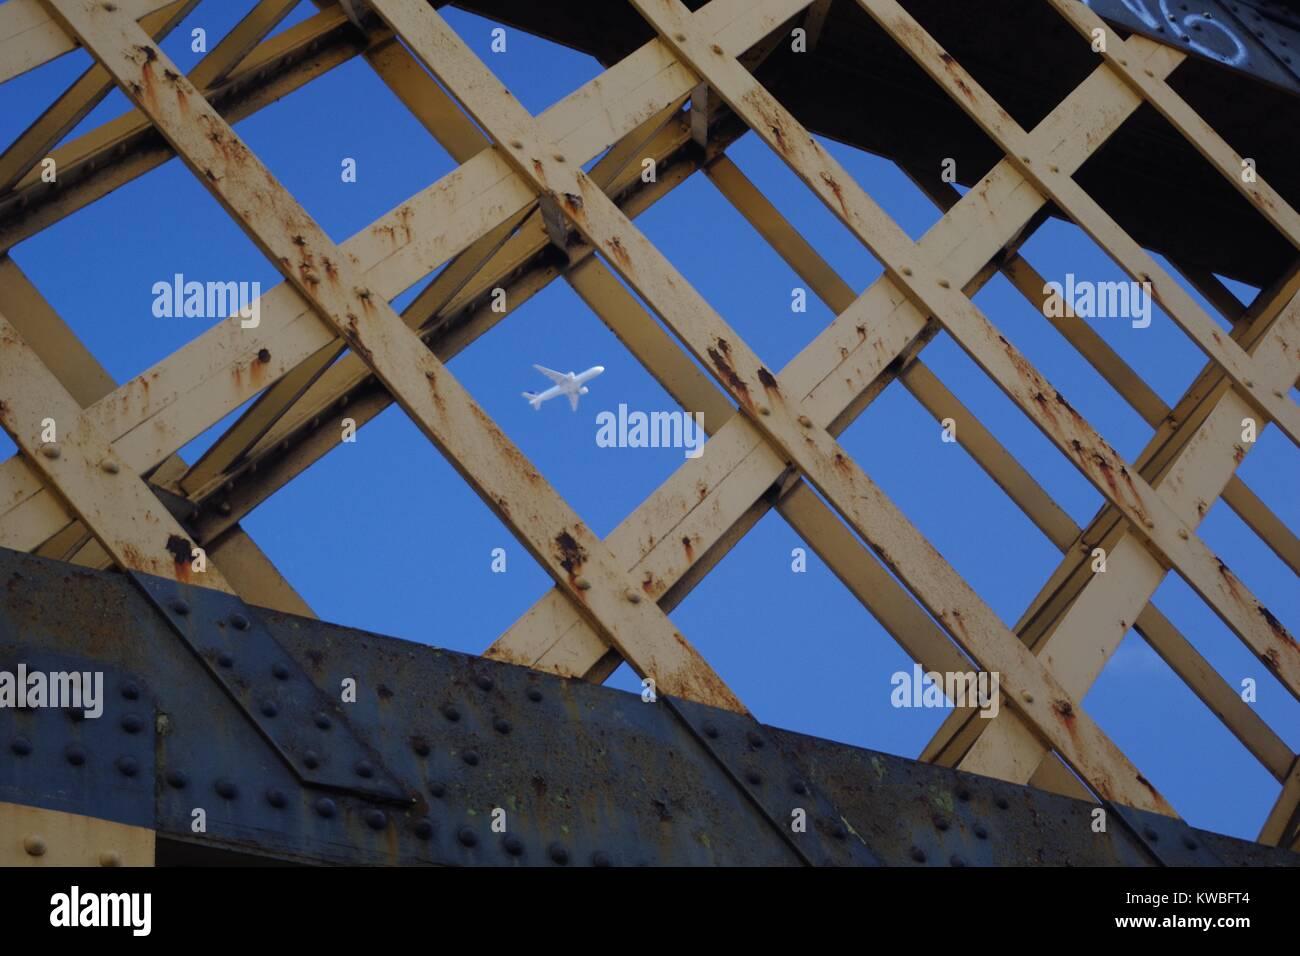 Cast Iron Waterloo Railway Line Bridge, Diamon Structure Framing a ...